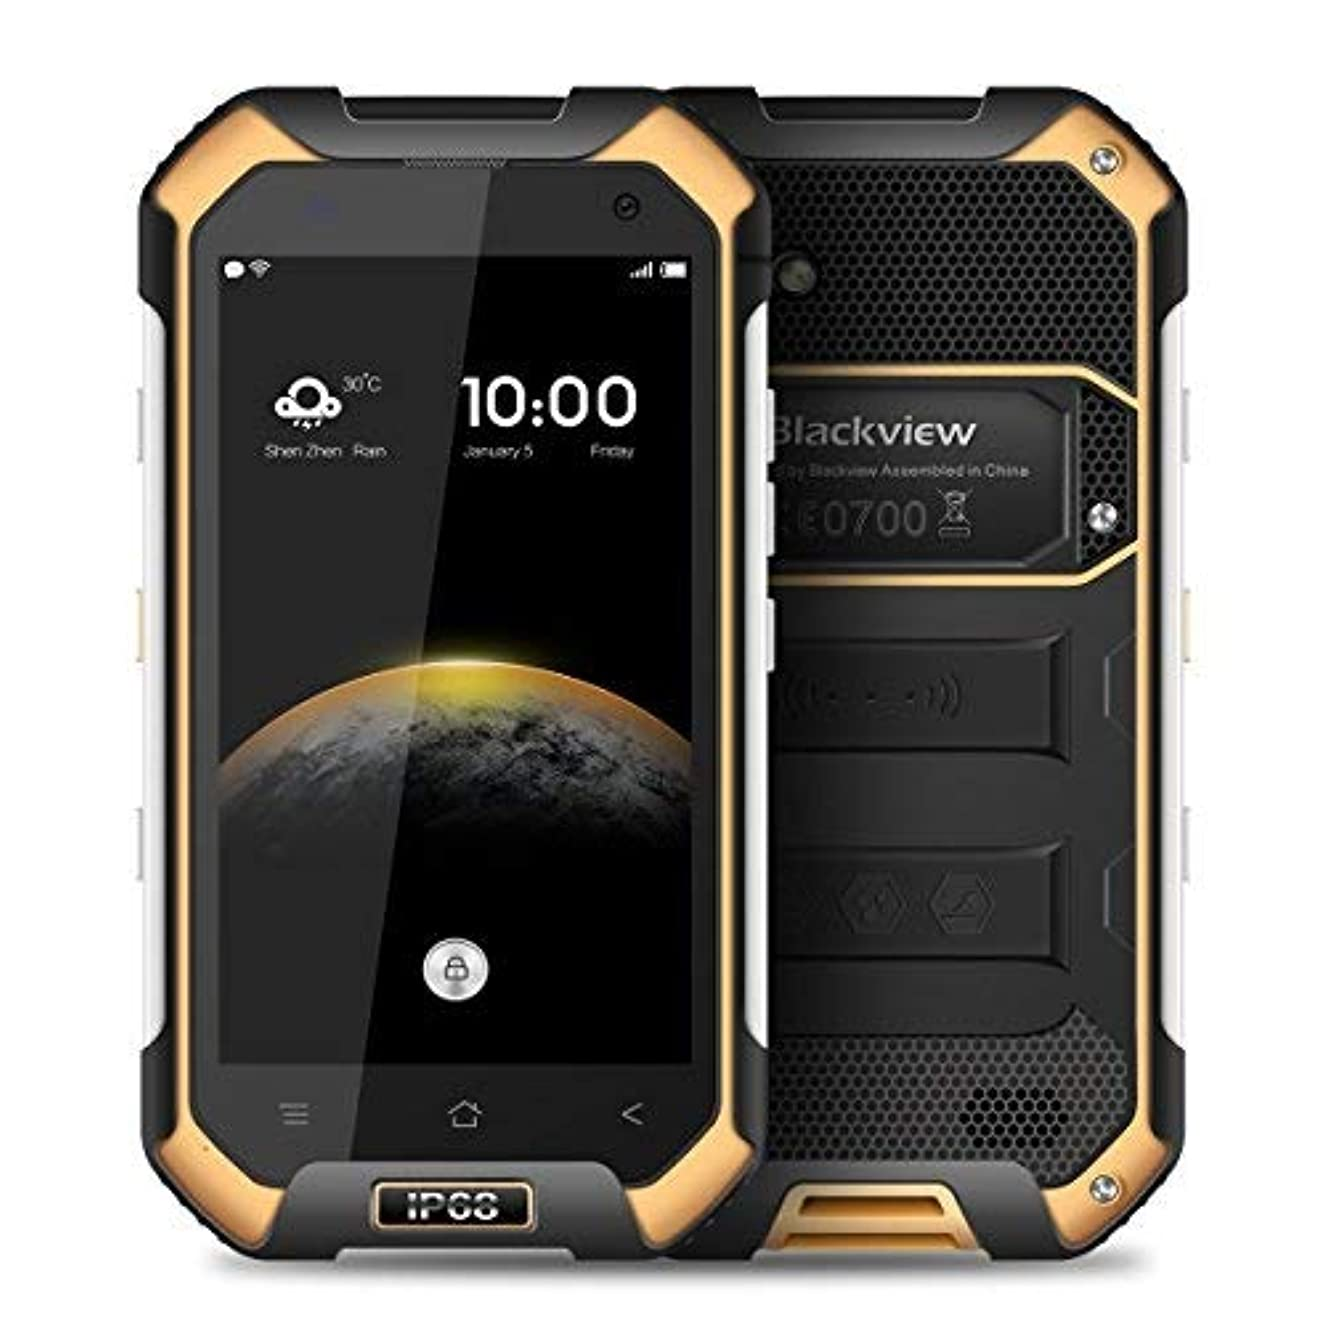 Unlocked Cell Phone Rugged, Blackview BV6000 Rugged Smartphone Dual Sim 4.7'' Octa Core 4G Phone IP68 Waterproof 3GB RAM+32GB ROM 13MP Camera AT& T Mobile NFC/GPS/SOS/GLONASS (Orange)